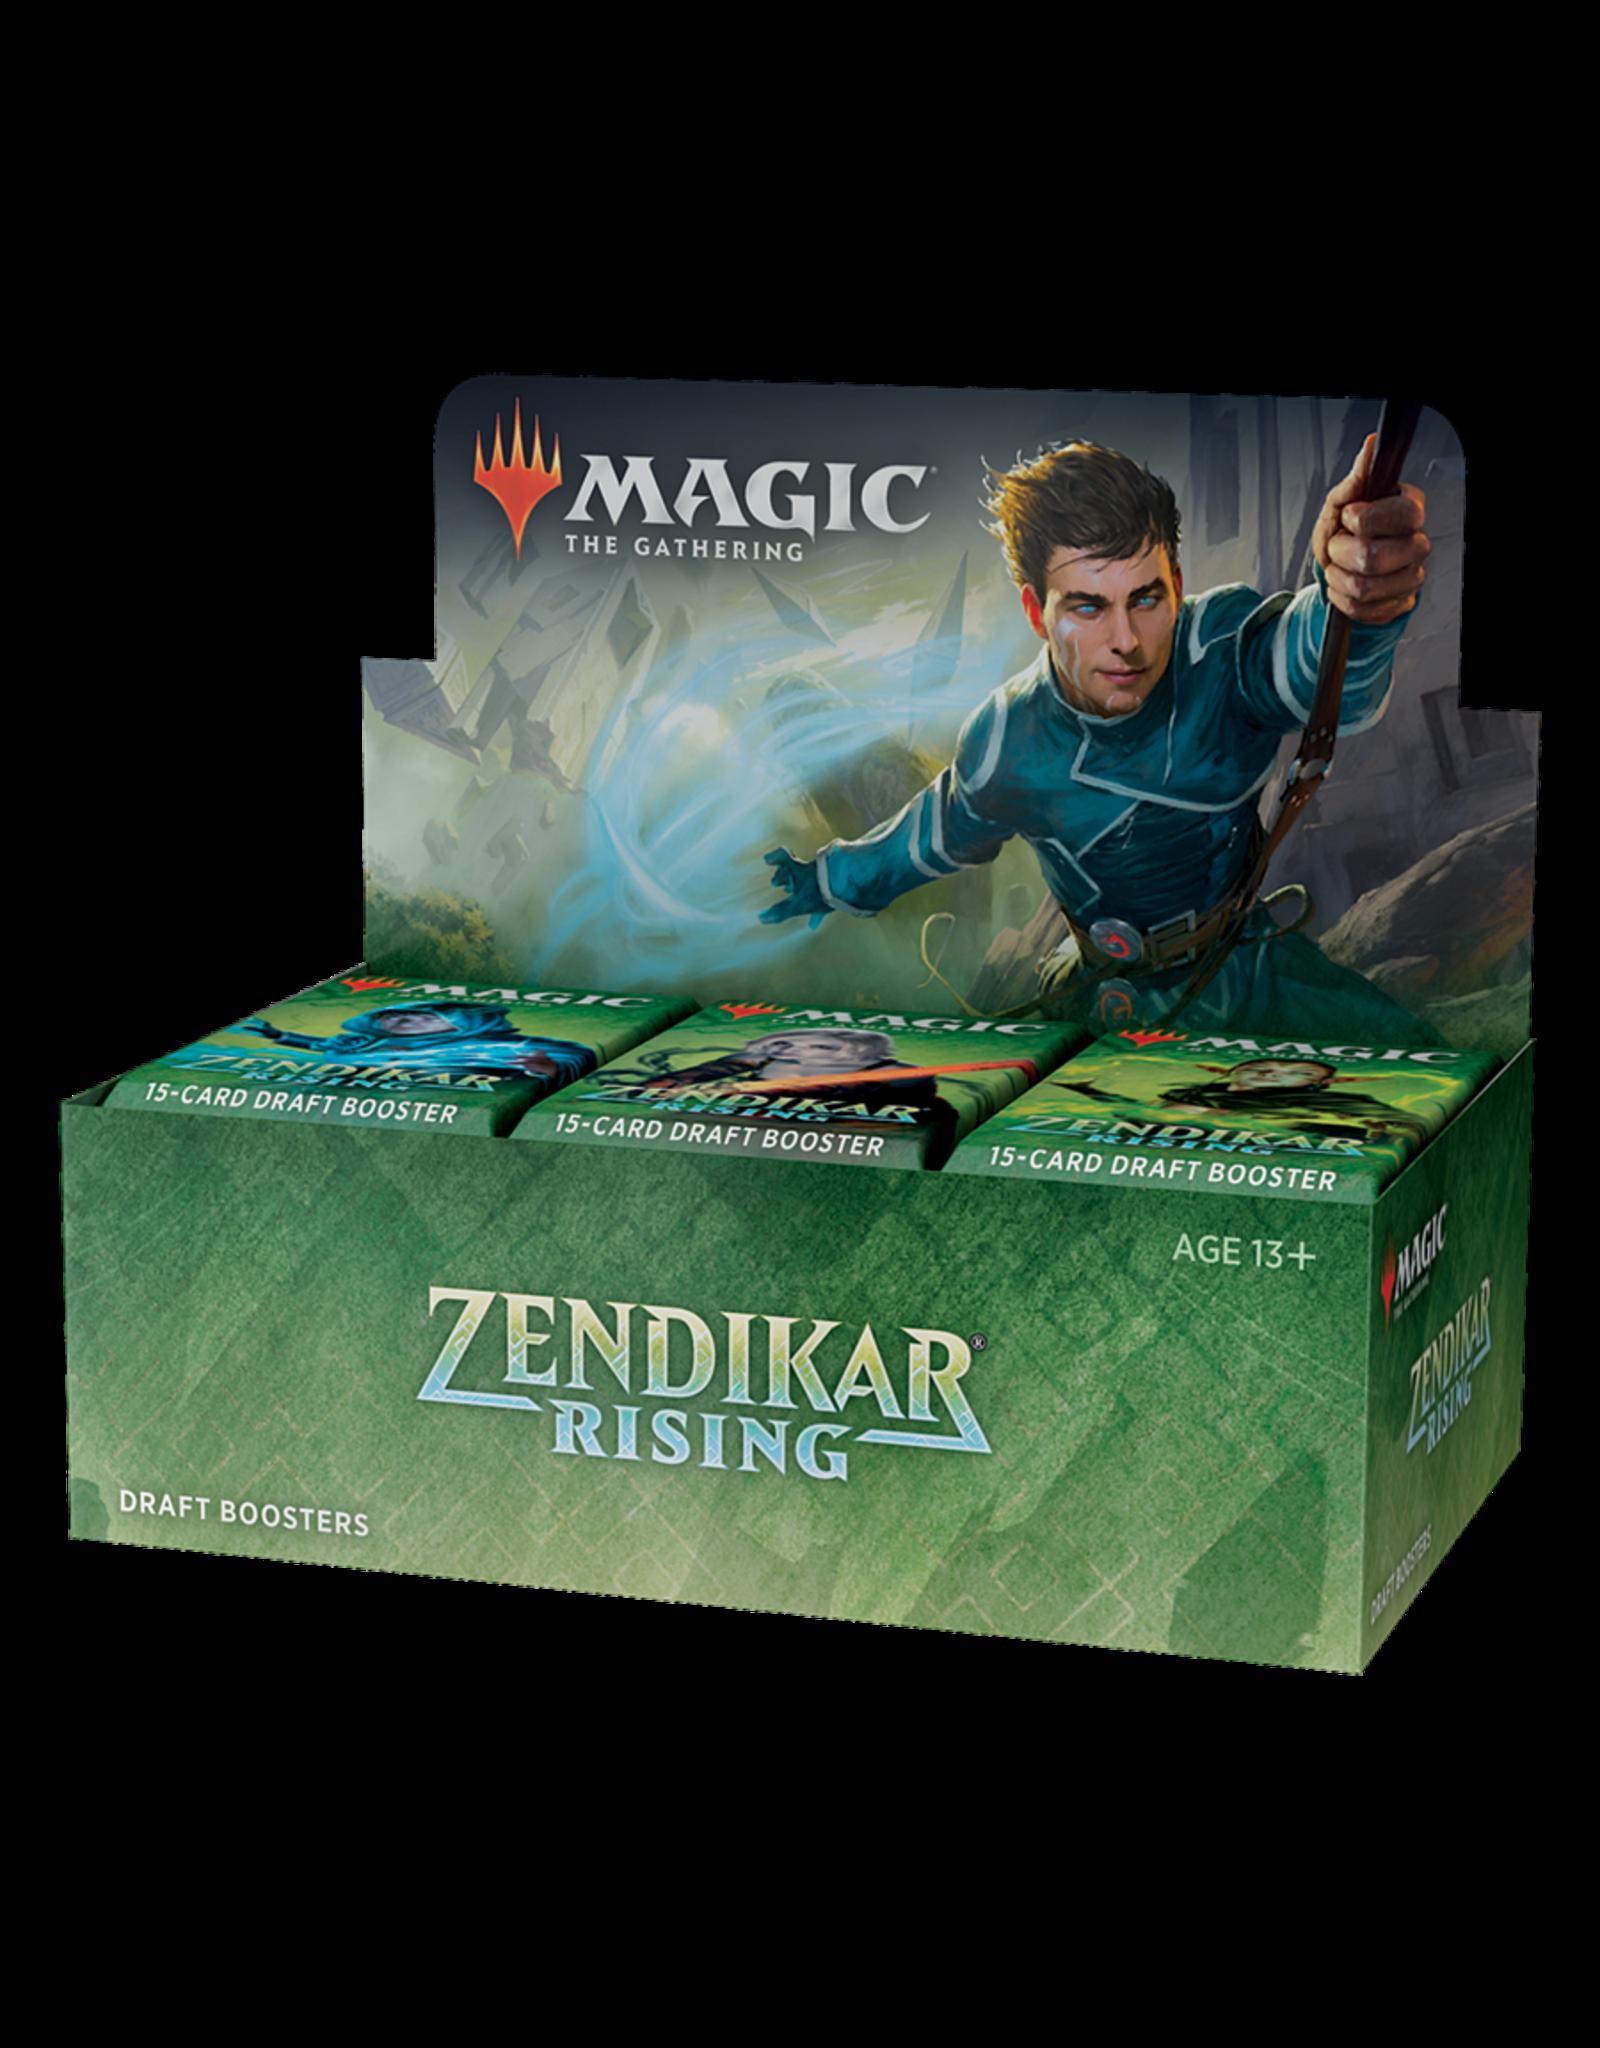 Magic: The Gathering Zendikar Rising Draft Booster Box